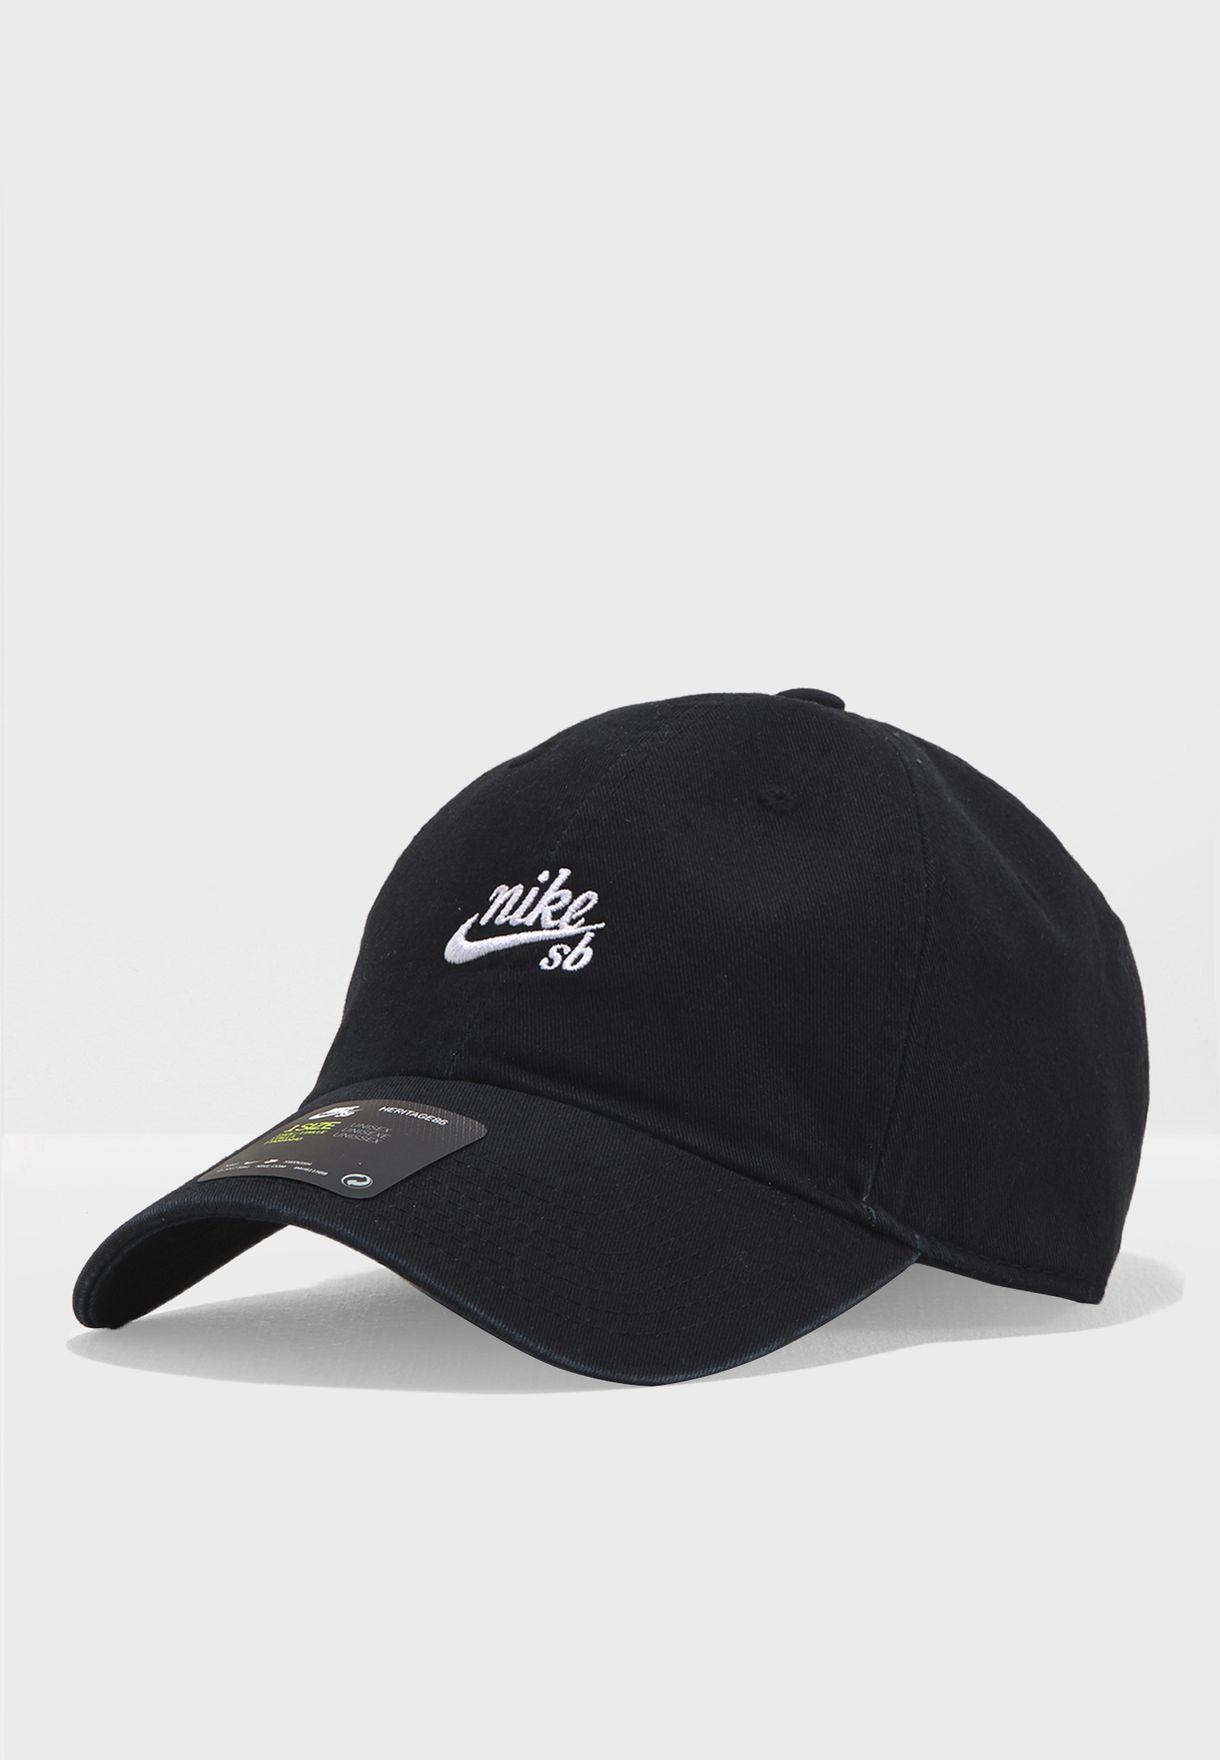 a50f1adc ... get shop nike black sb h86 vintage cap 926687 010 for men in uae  ni727ac92jnn bbf88